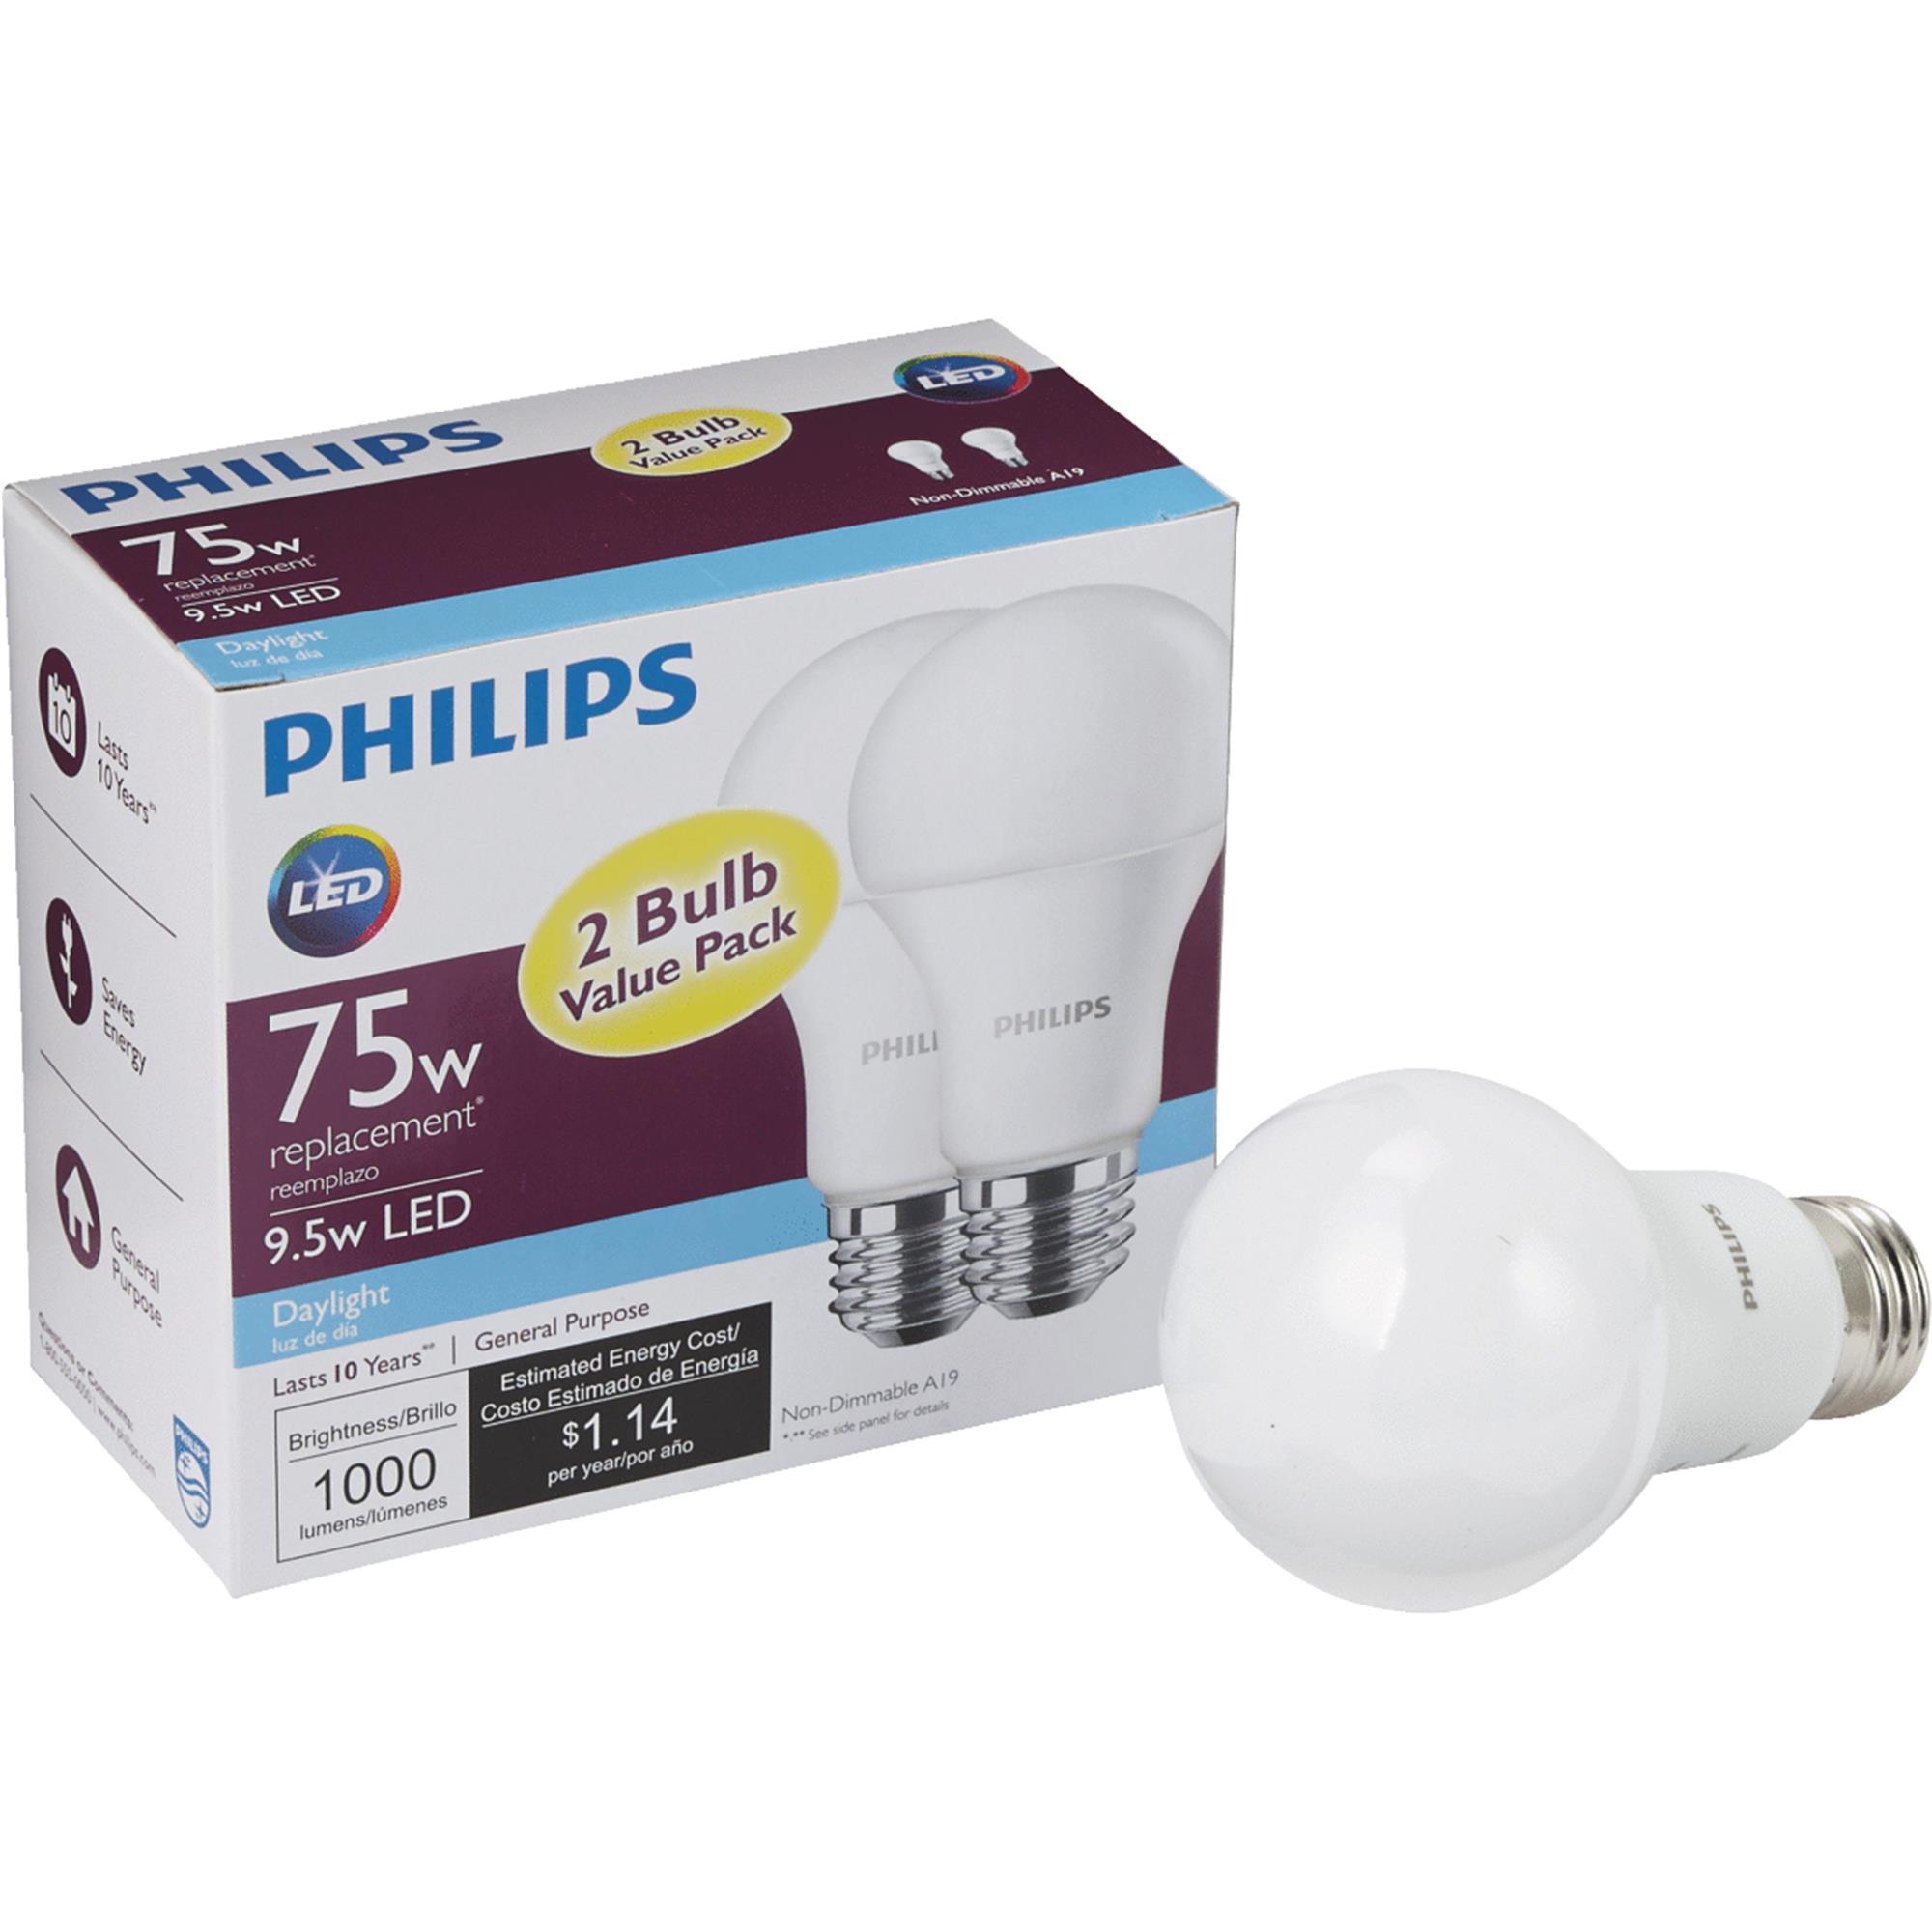 Philips LED 9.5W (75 Watt Equivalent) Daylight Standard A19 Light Bulb, 2 CT